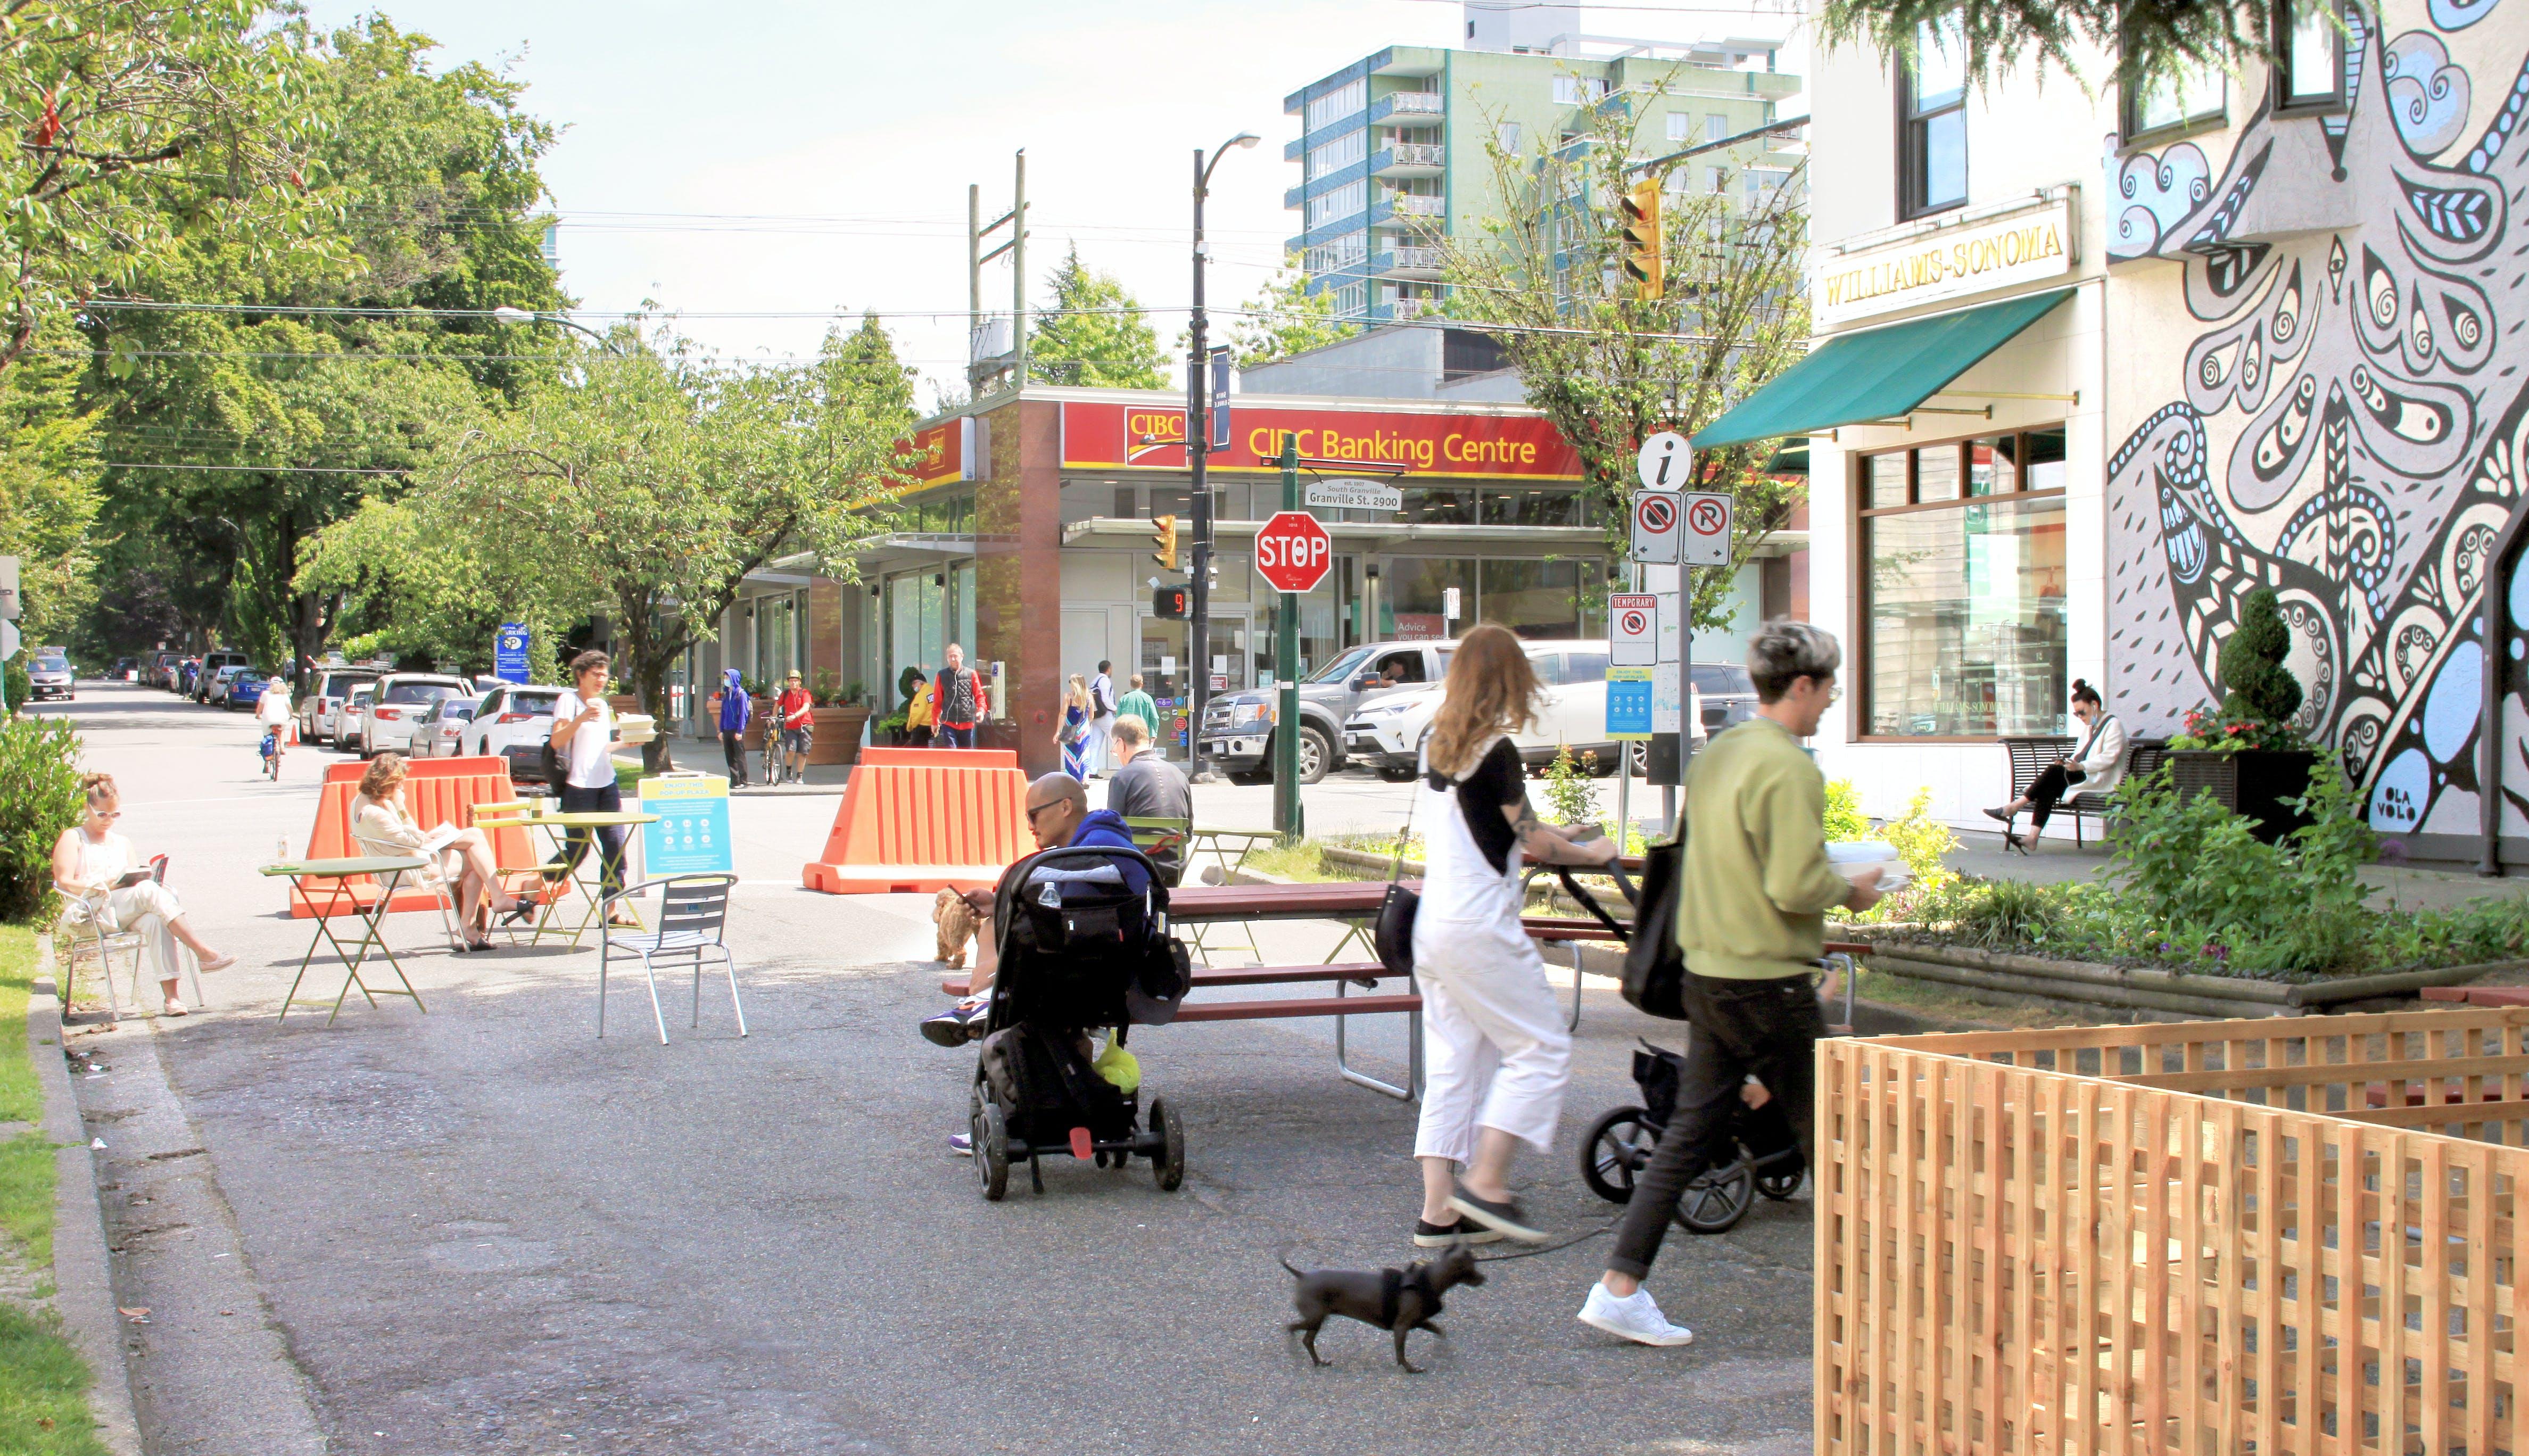 13th & Granville Pop-up Plaza